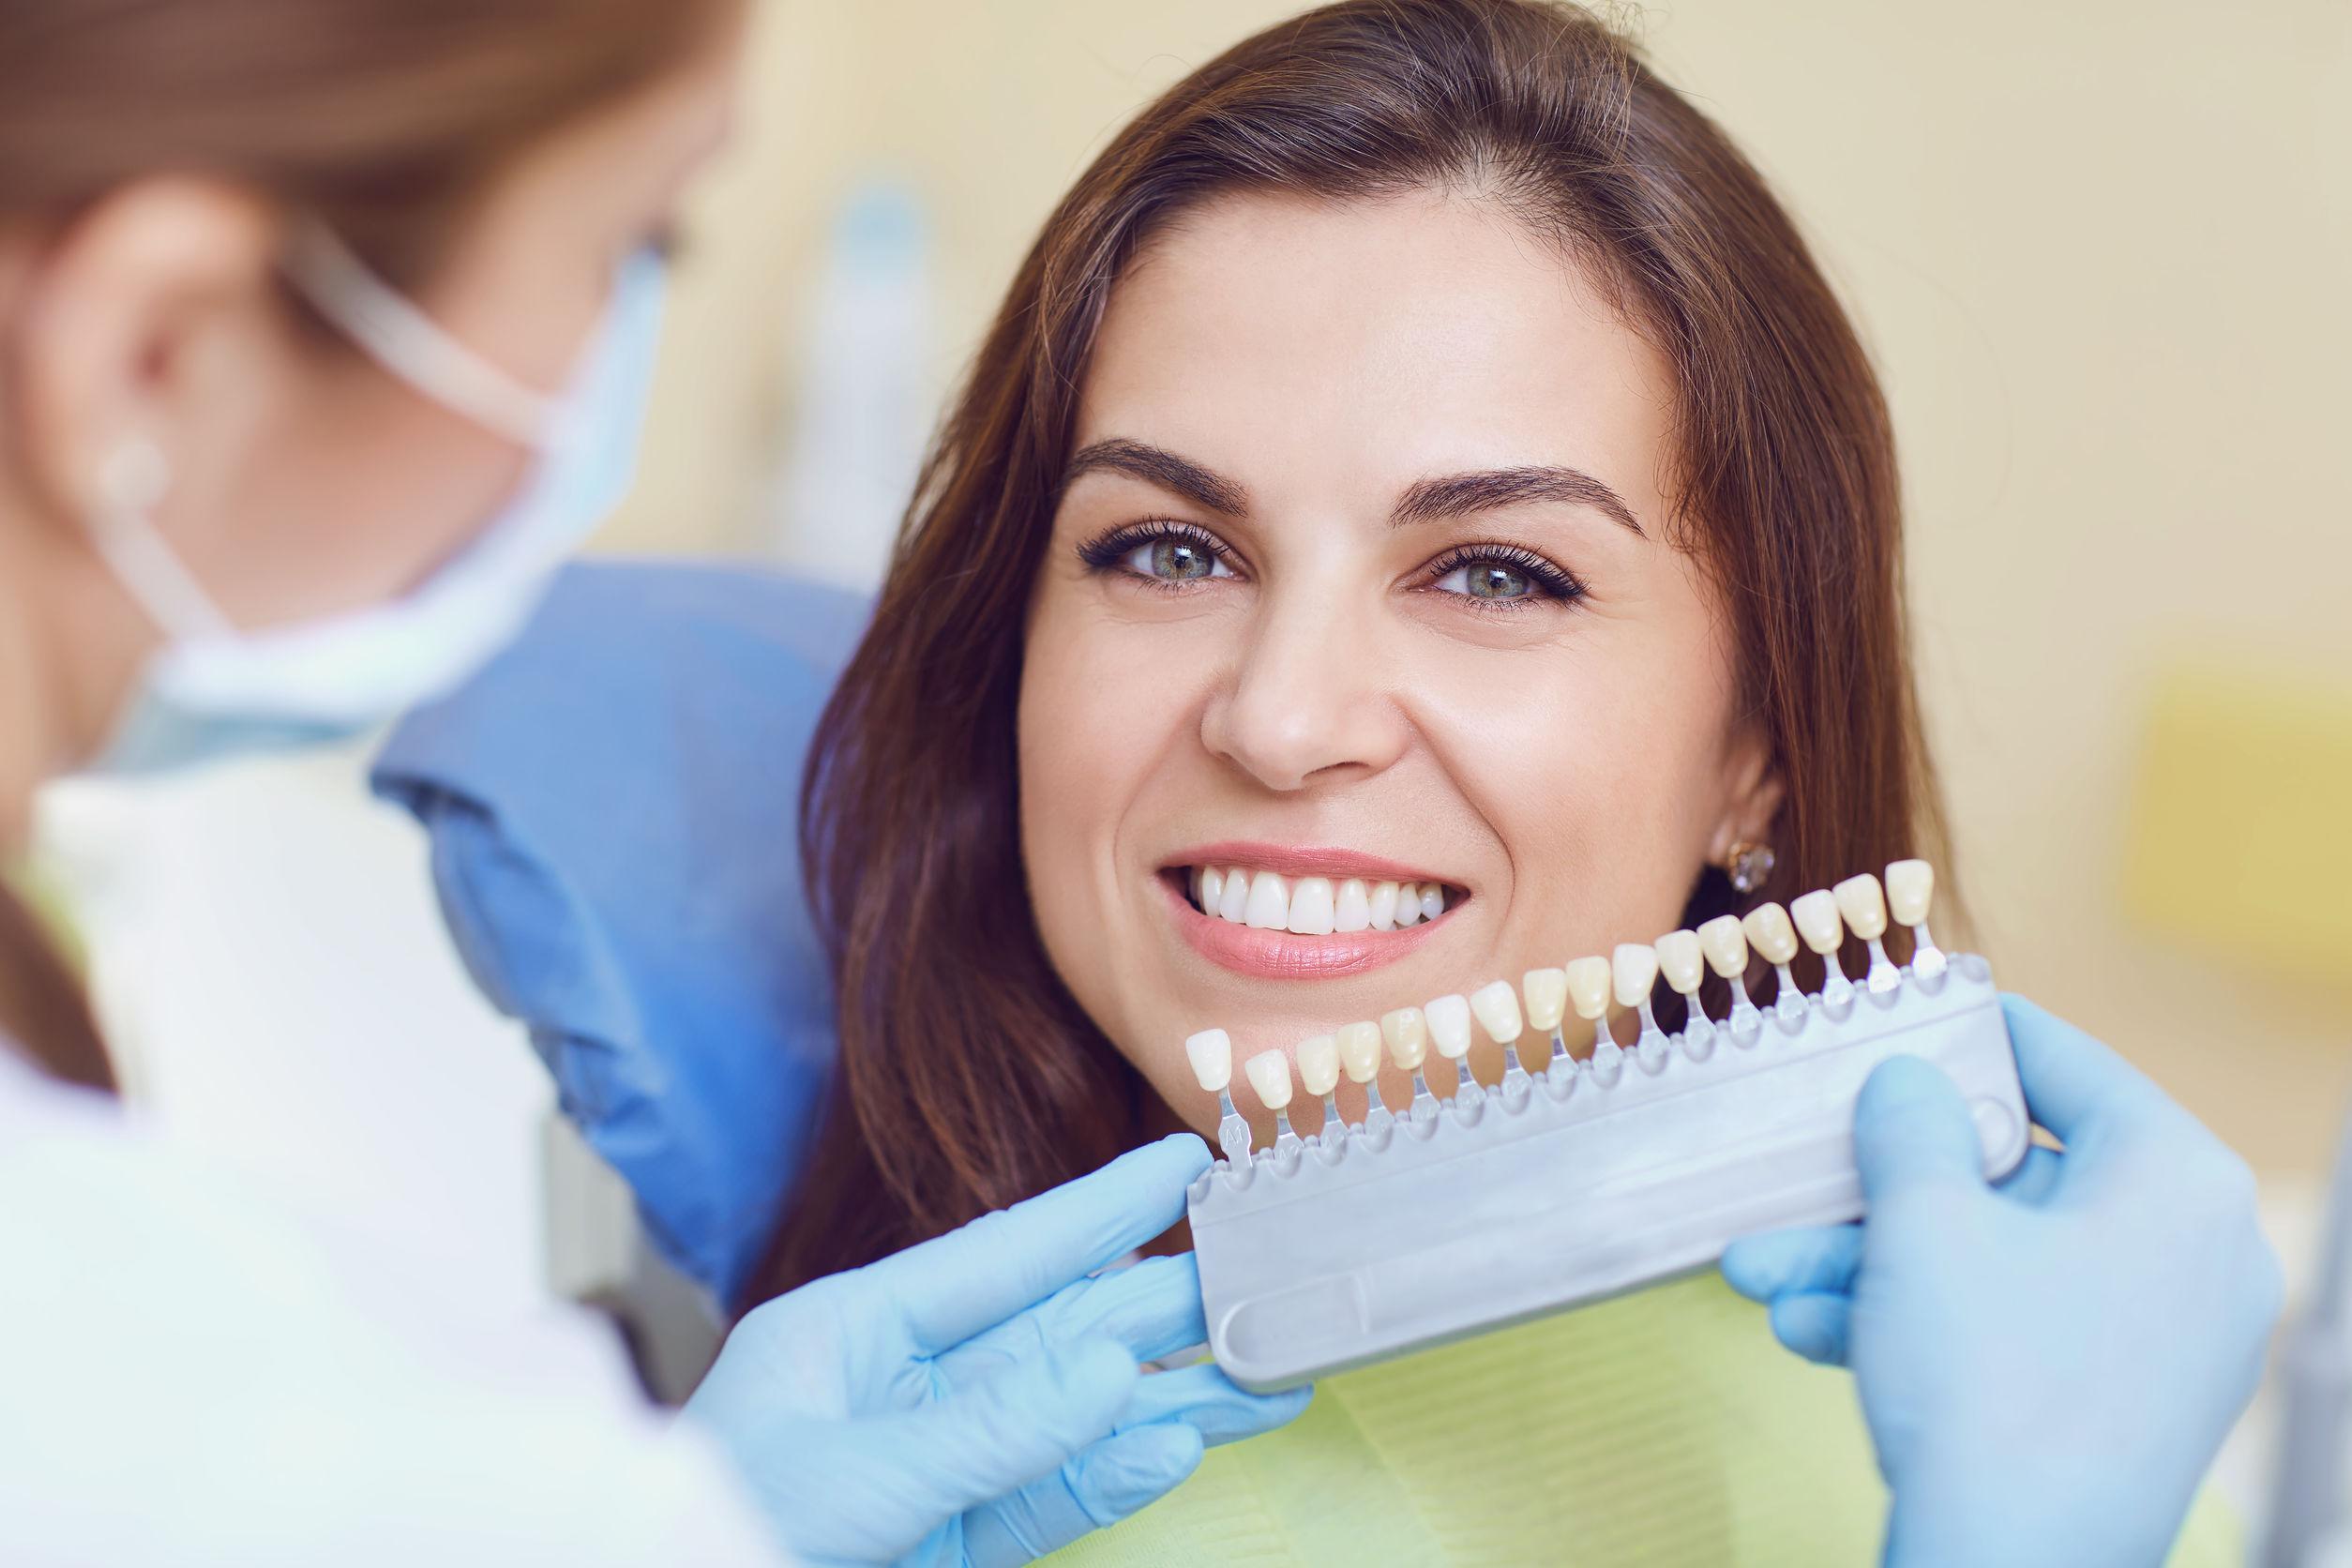 Demed Łomża - stomatolog, dentysta